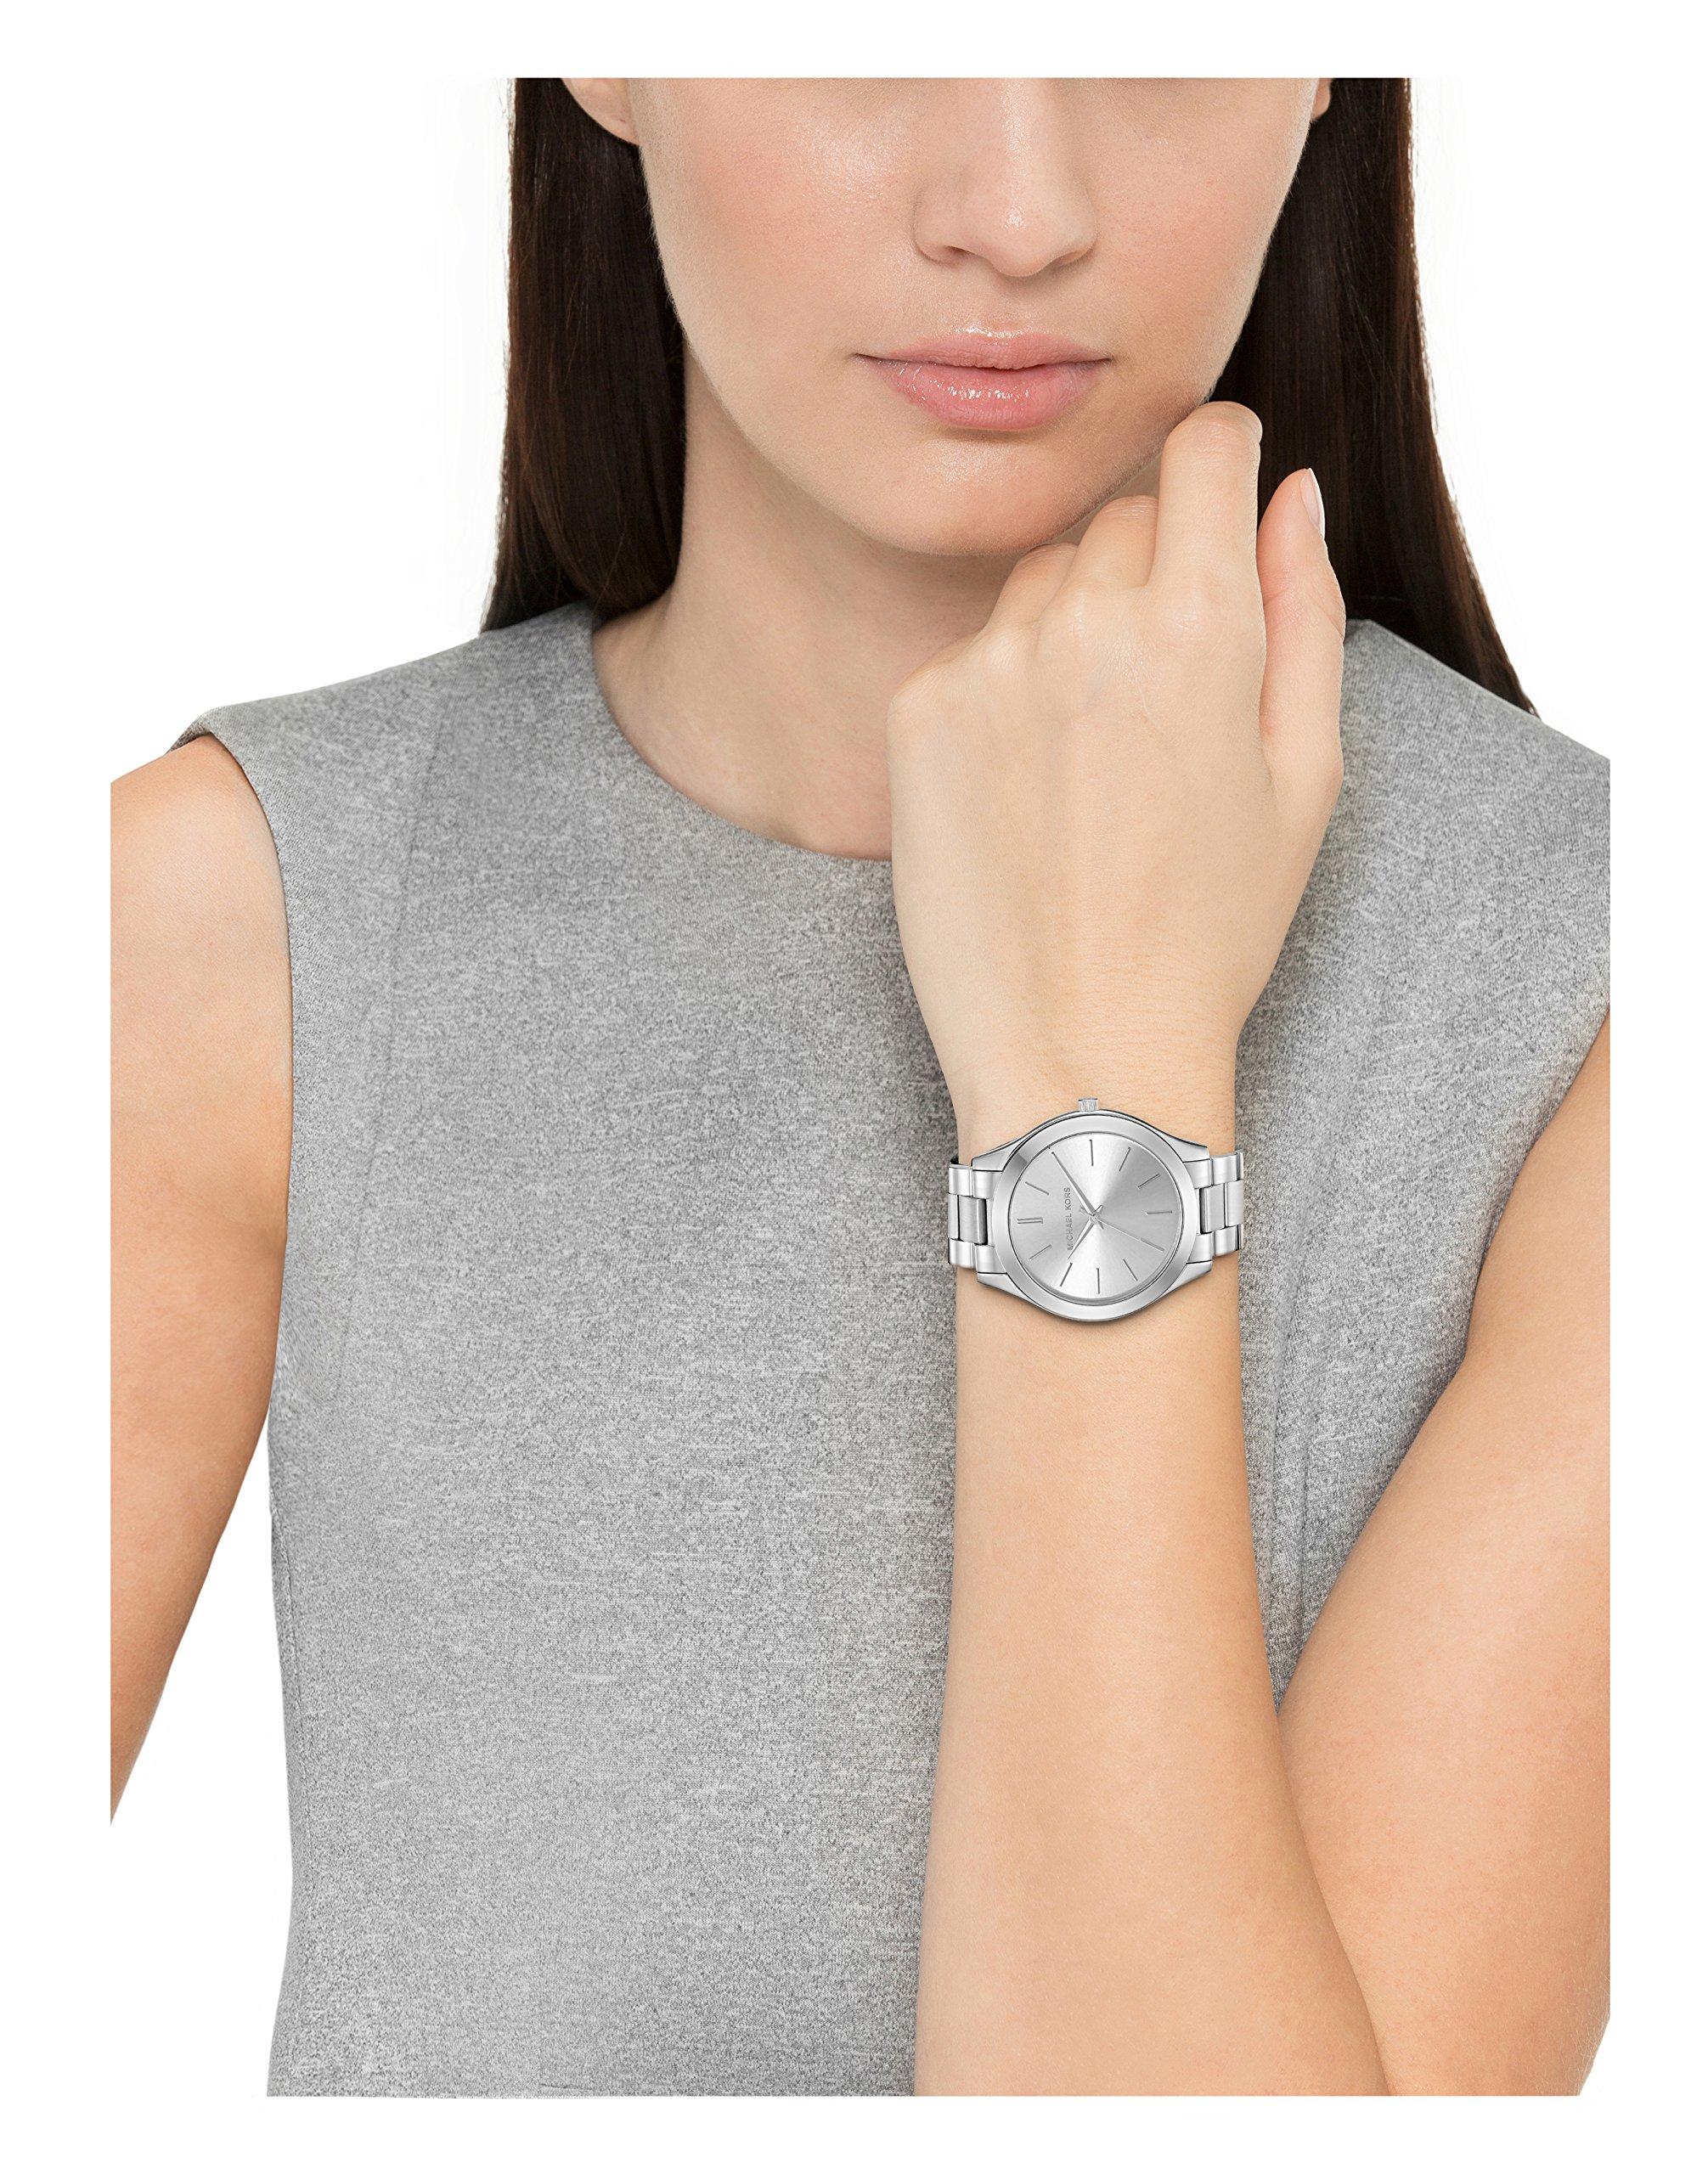 Michael Kors Women's Runway Silver-Tone Watch MK3178 by Michael Kors (Image #2)